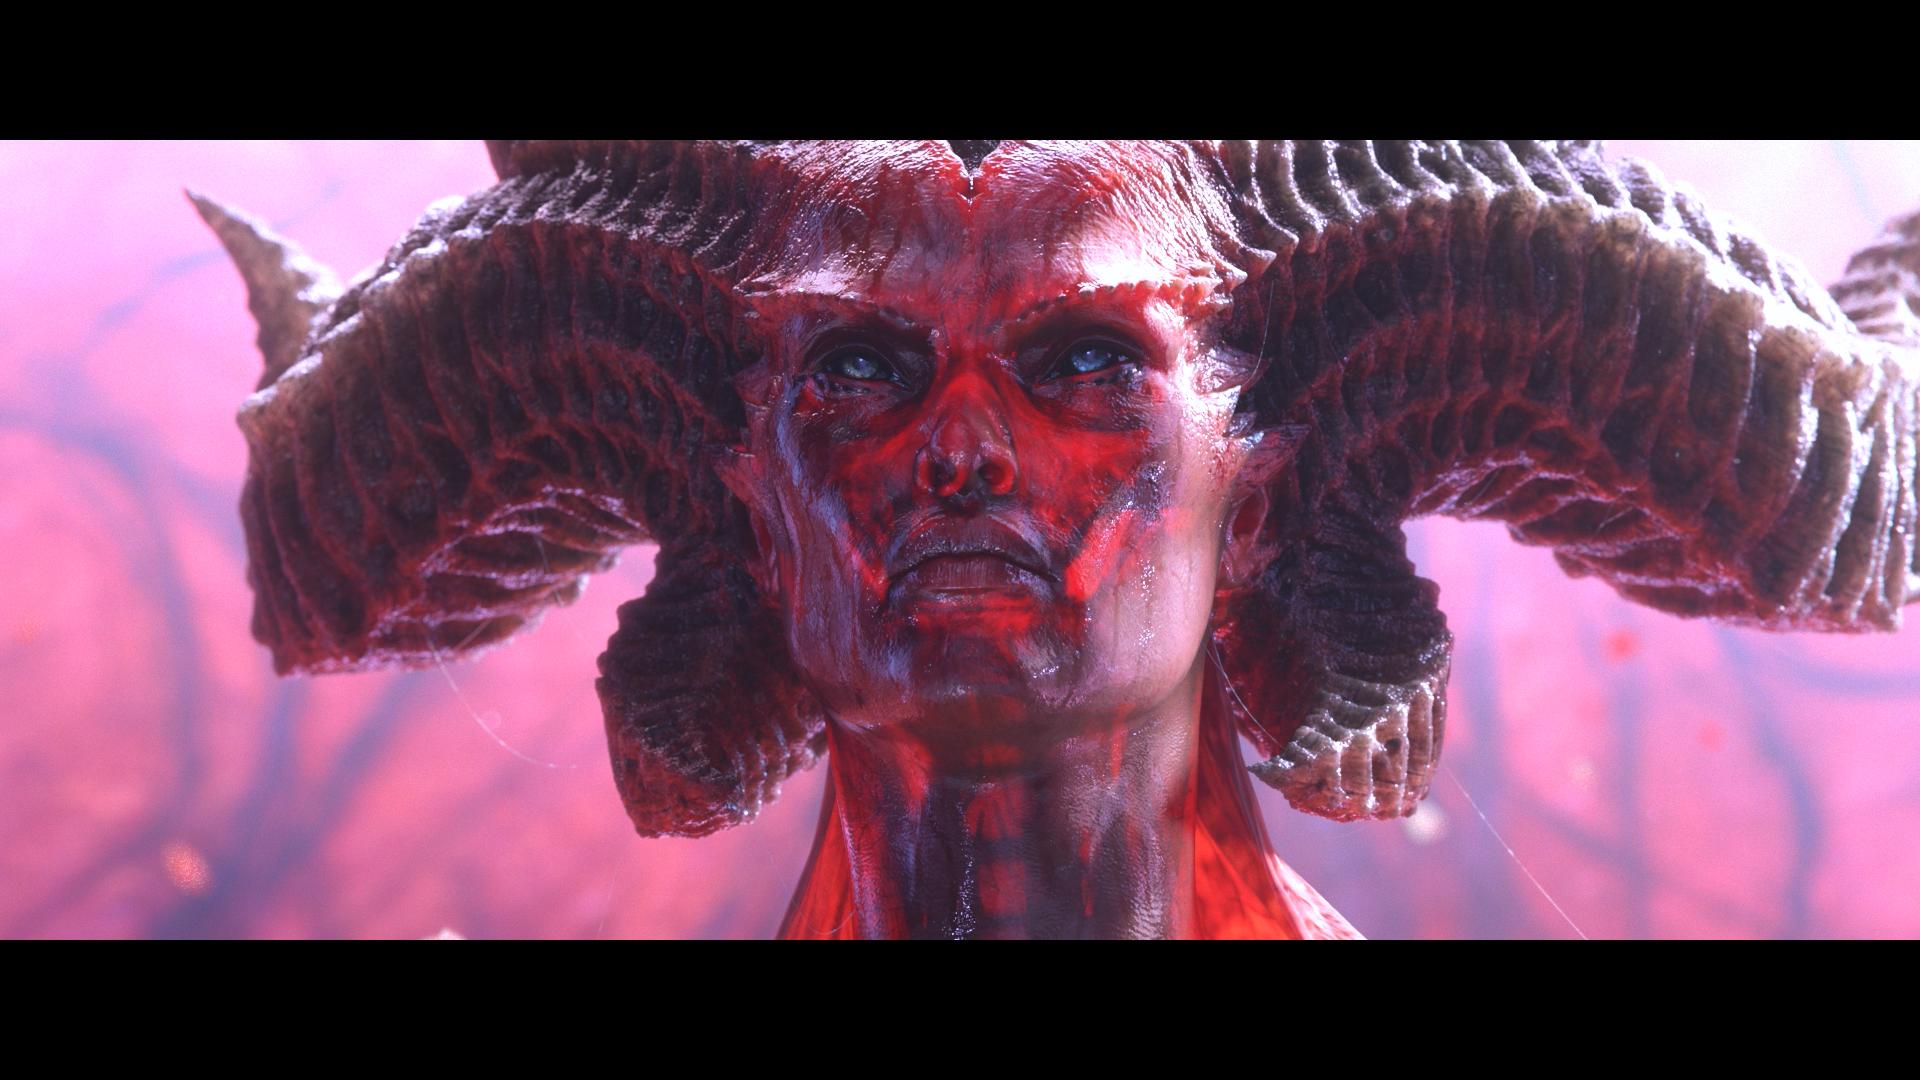 DiabloIV - Announce Cinematic Trailer [MULTI].mkv_snapshot_08.39_[2020.01.23_07.01.11].png